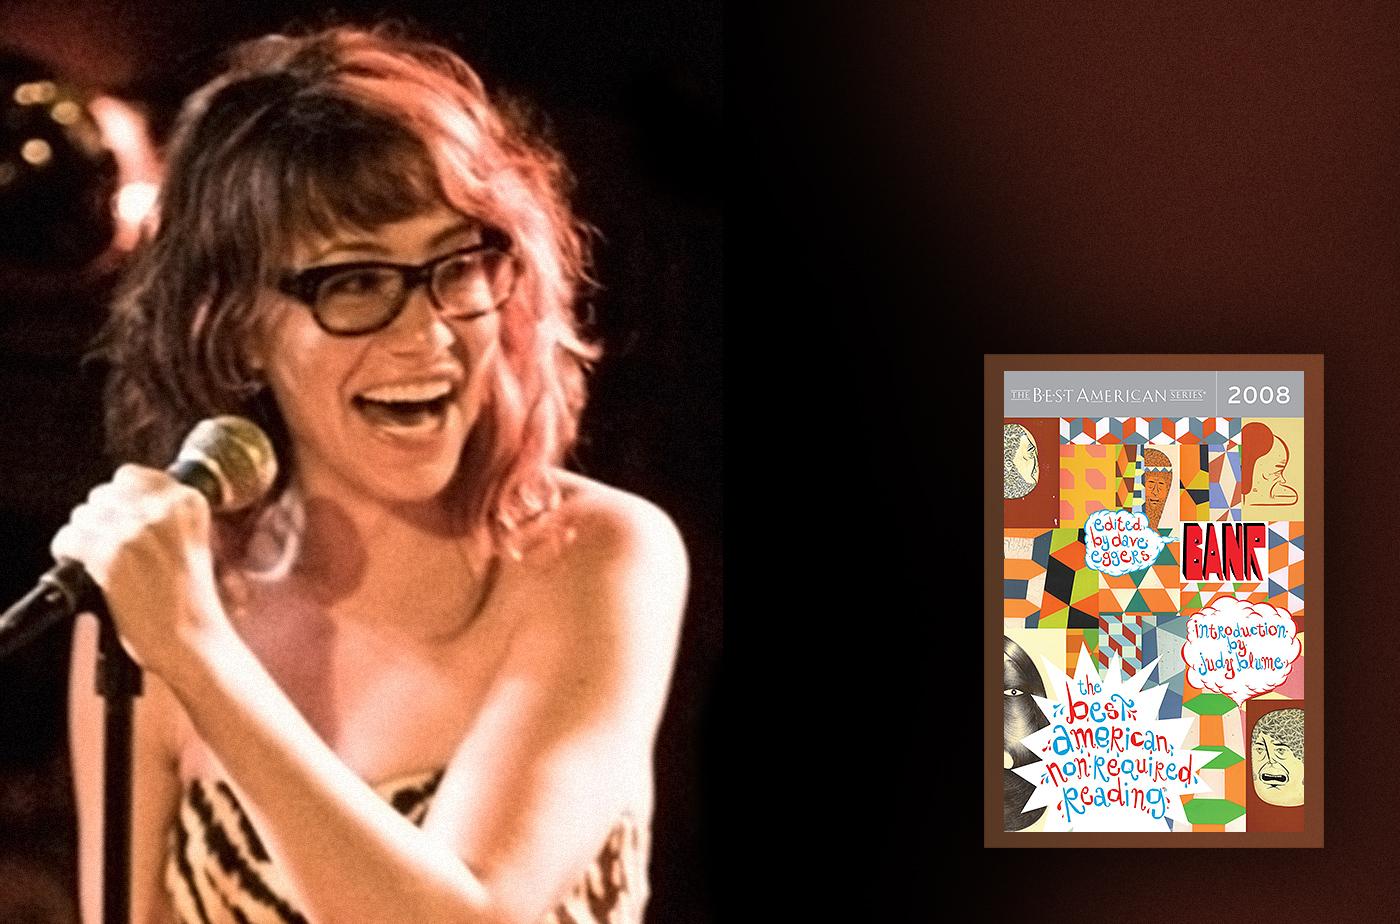 Catapult  classes: Elissa Bassist, 6-Week Humor Writing Workshop, Comedy, Workshop